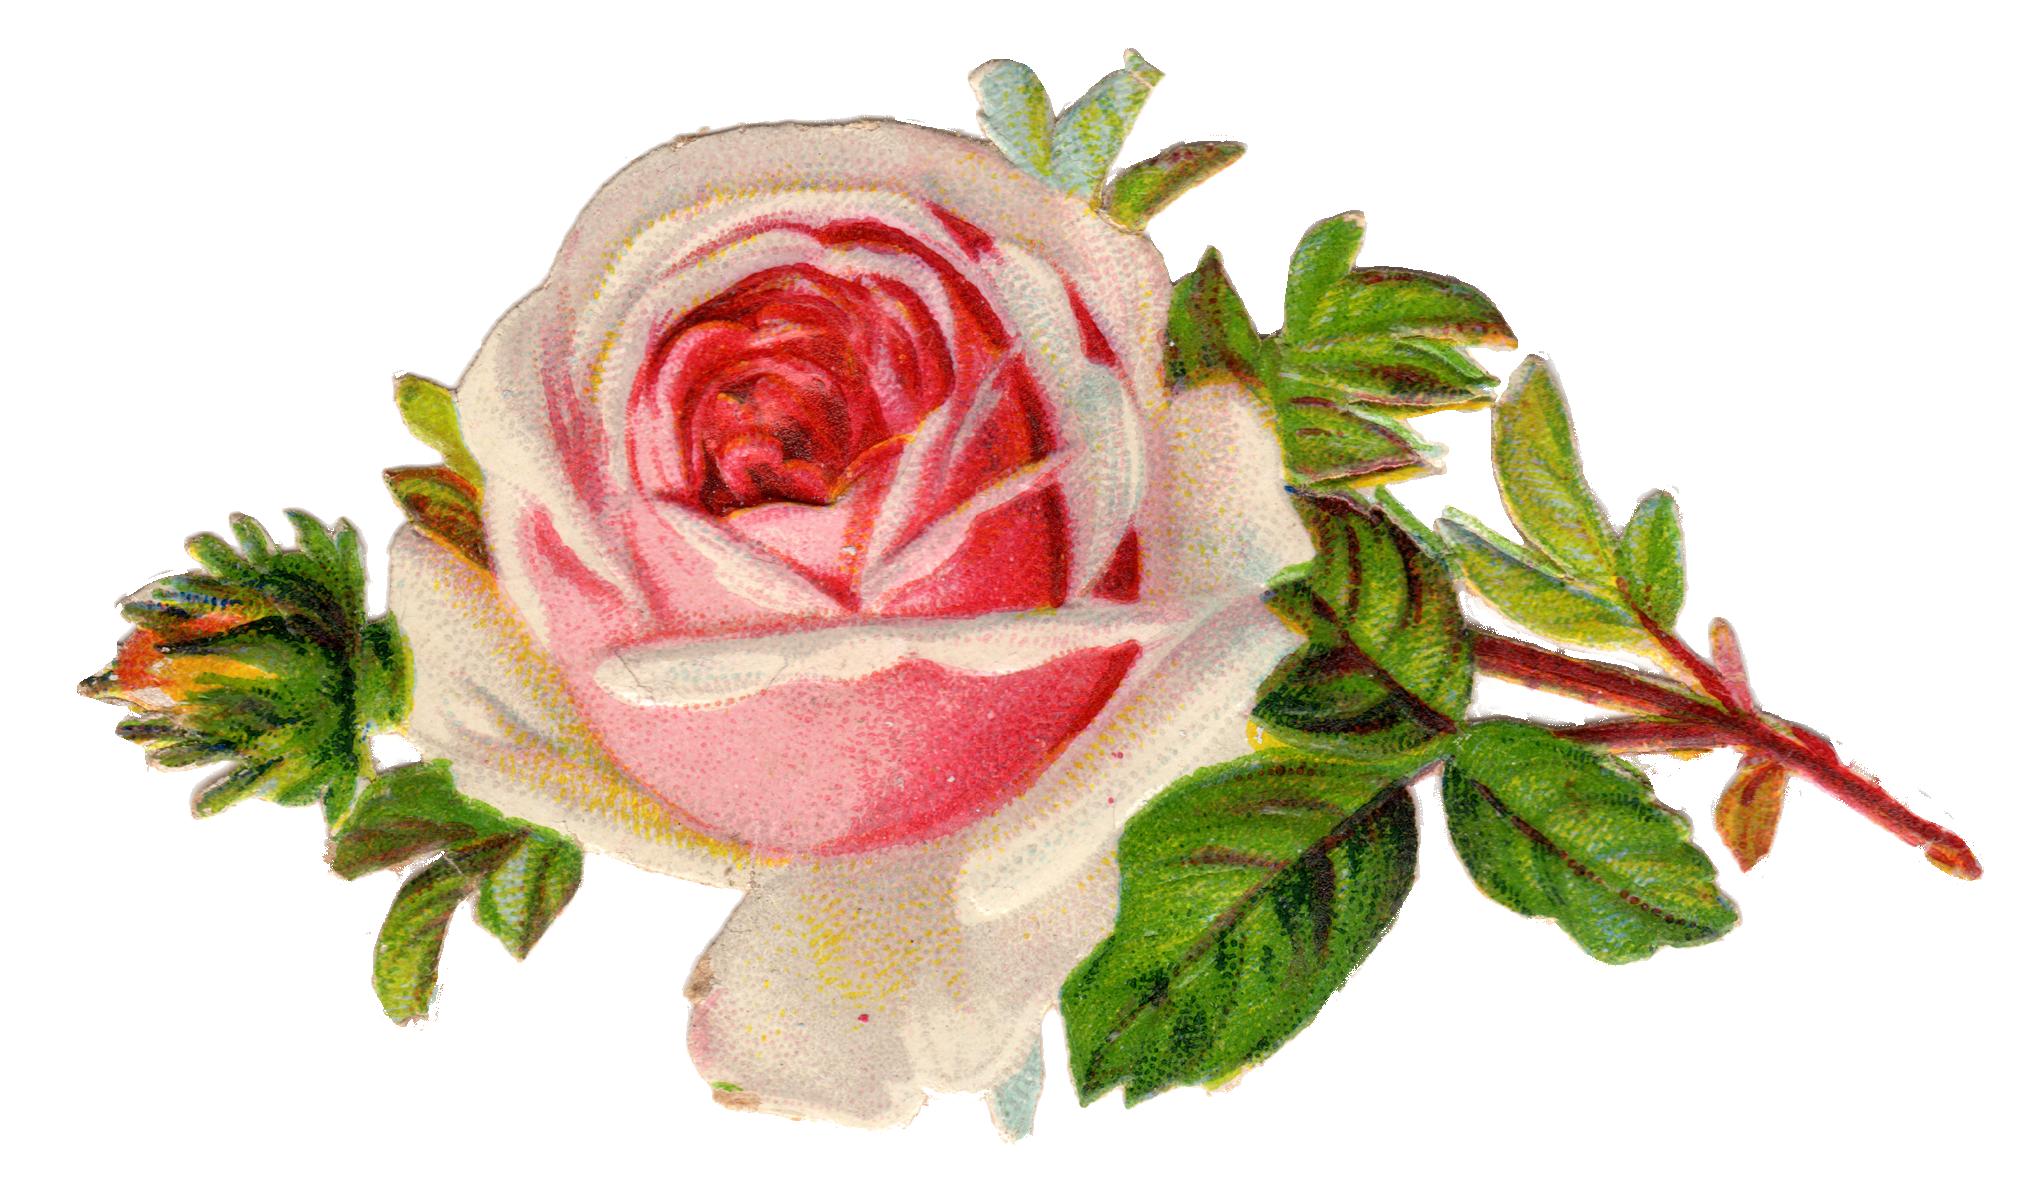 clipart download Vintage clipart. Free rose clip art